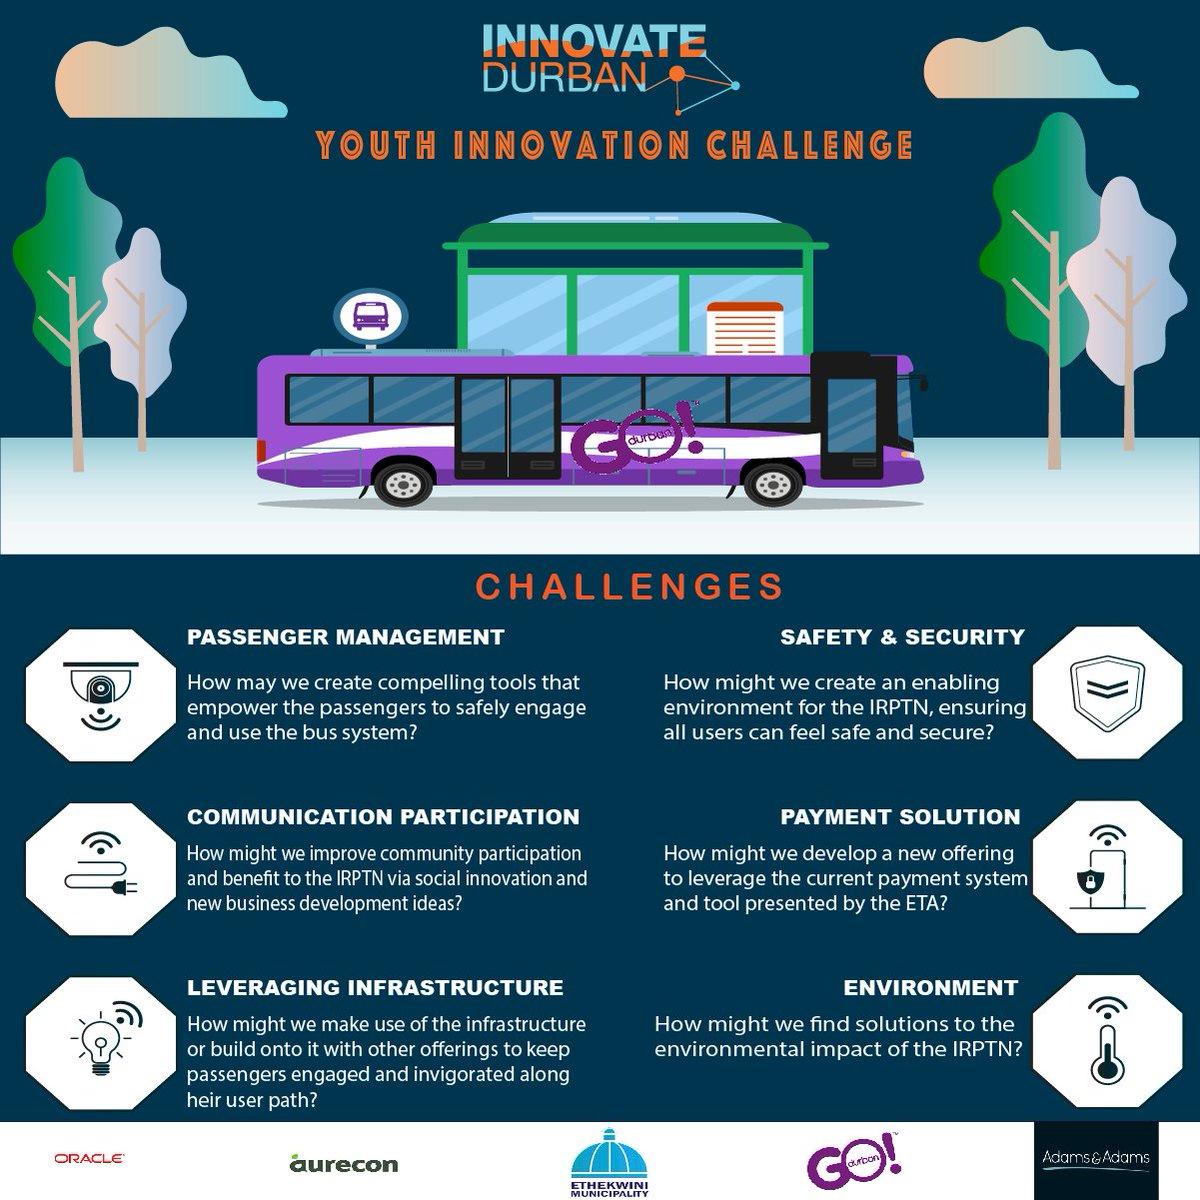 Innovate Durban (@InnovateDurban) | Twitter